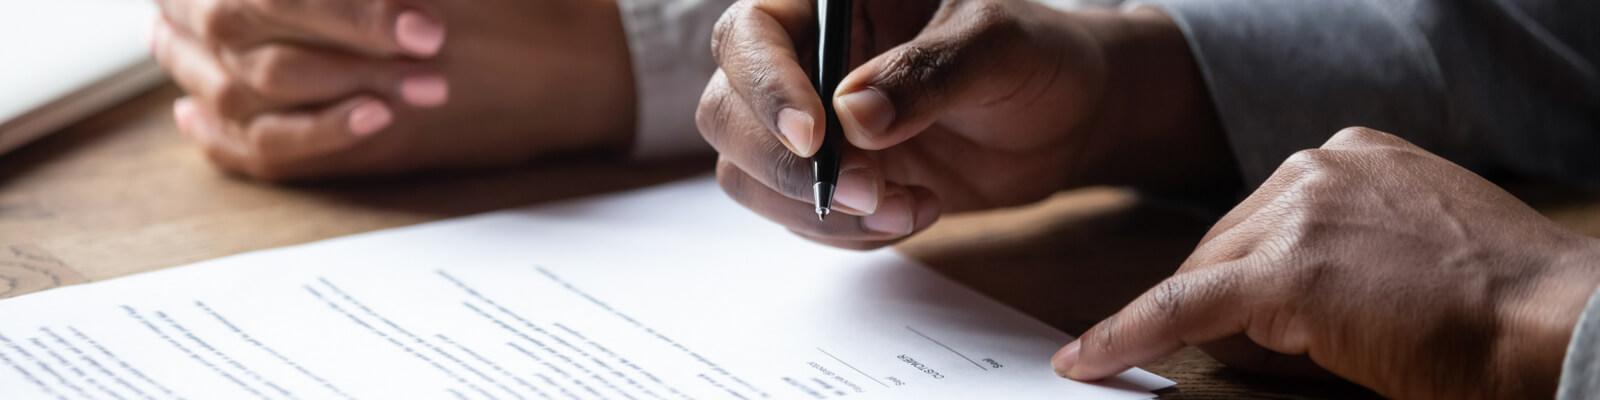 What Is an SBA Preferred Lender?